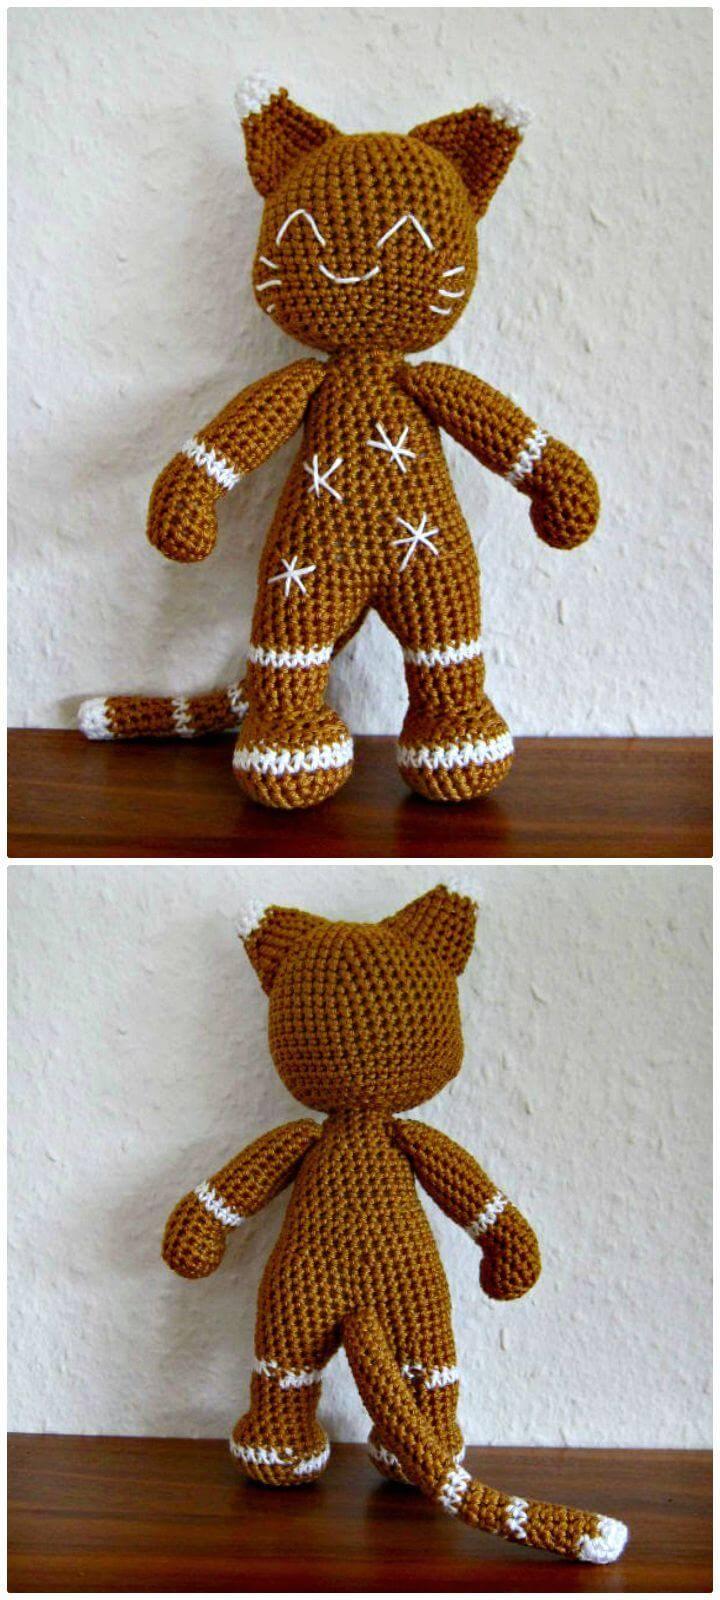 Crochet The Gingerbread Cat - Free Amigurumi Pattern